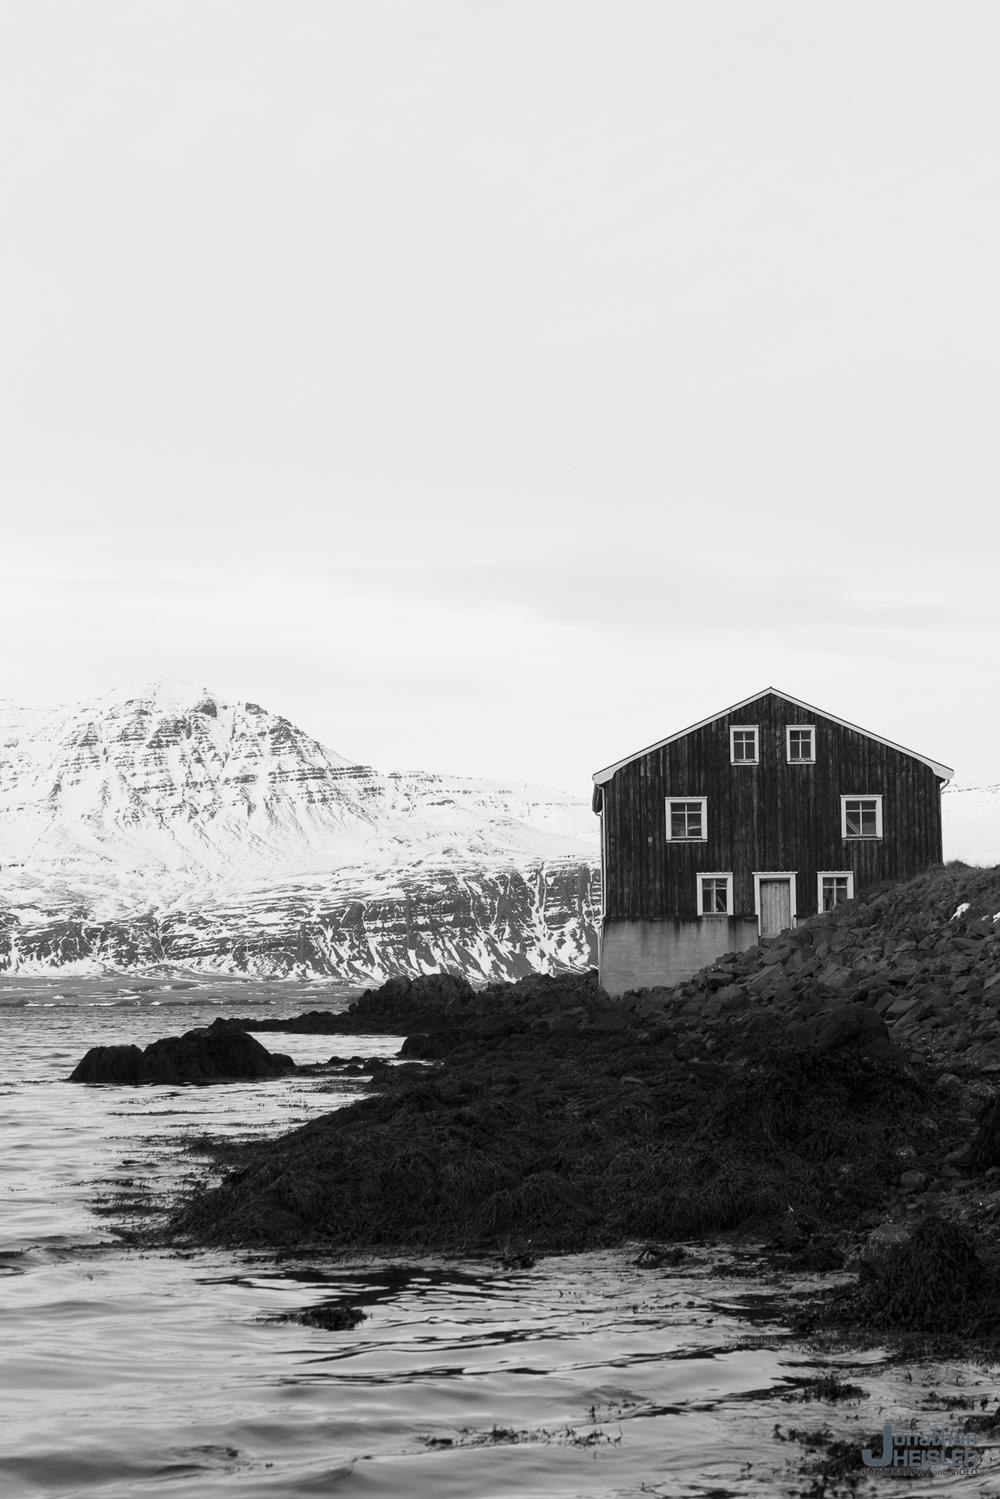 Iceland Winter Photos_  Jonathan Heisler __  02292016 _ 034.jpg